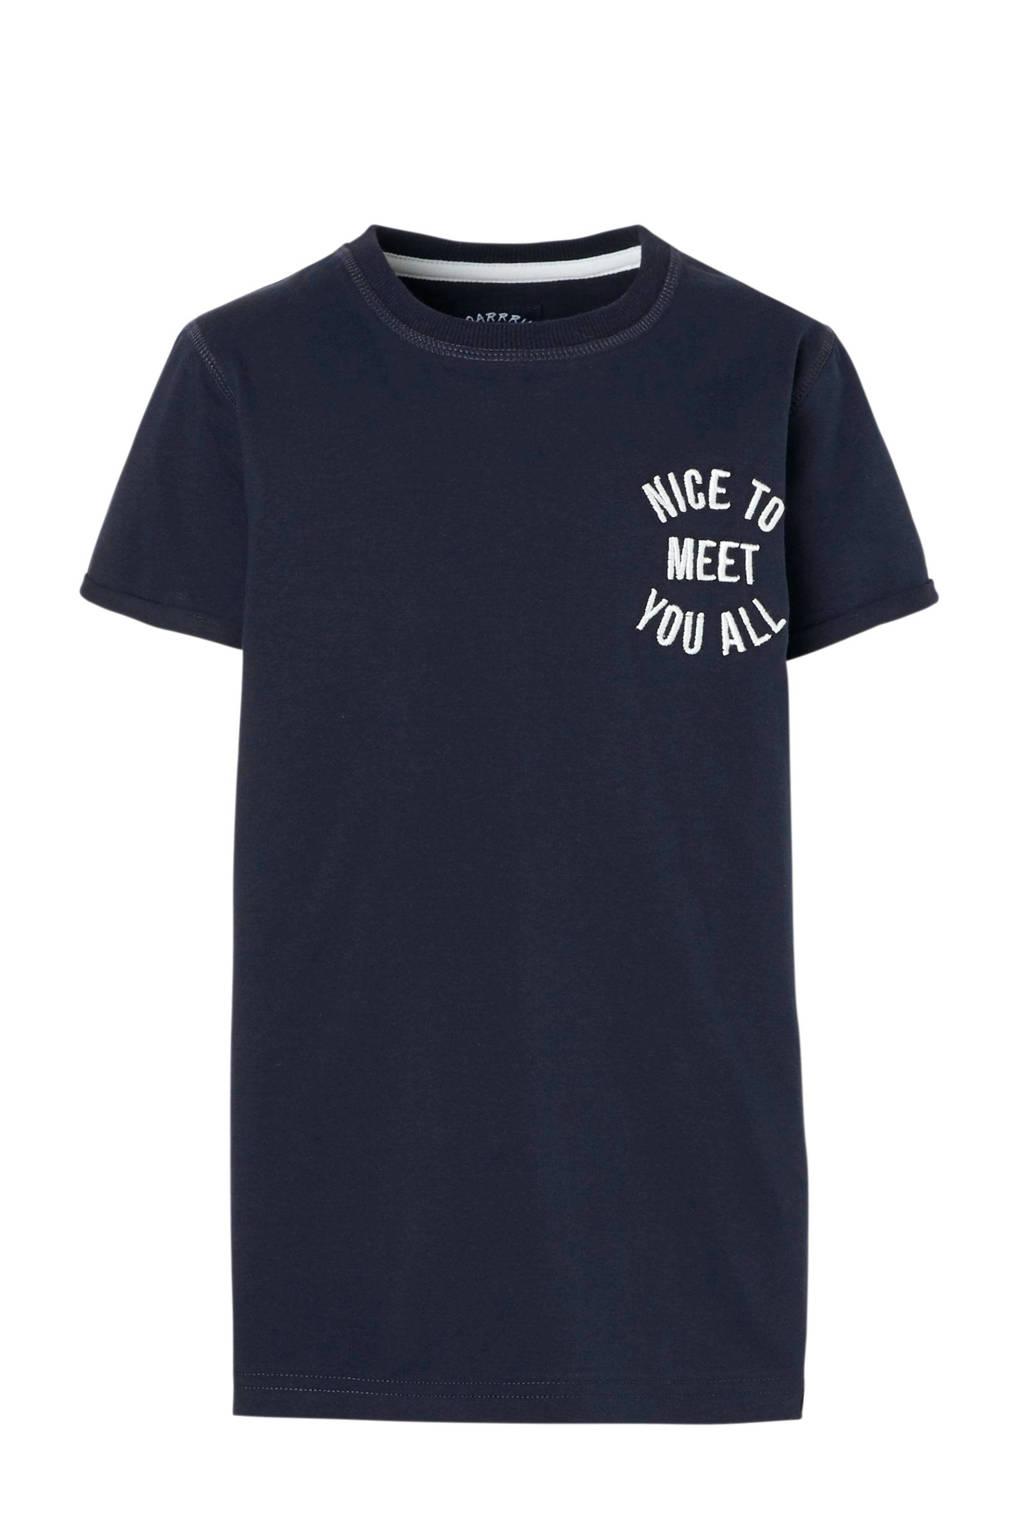 Z8 T-shirt met tekst donkerblauw, Donkerblauw